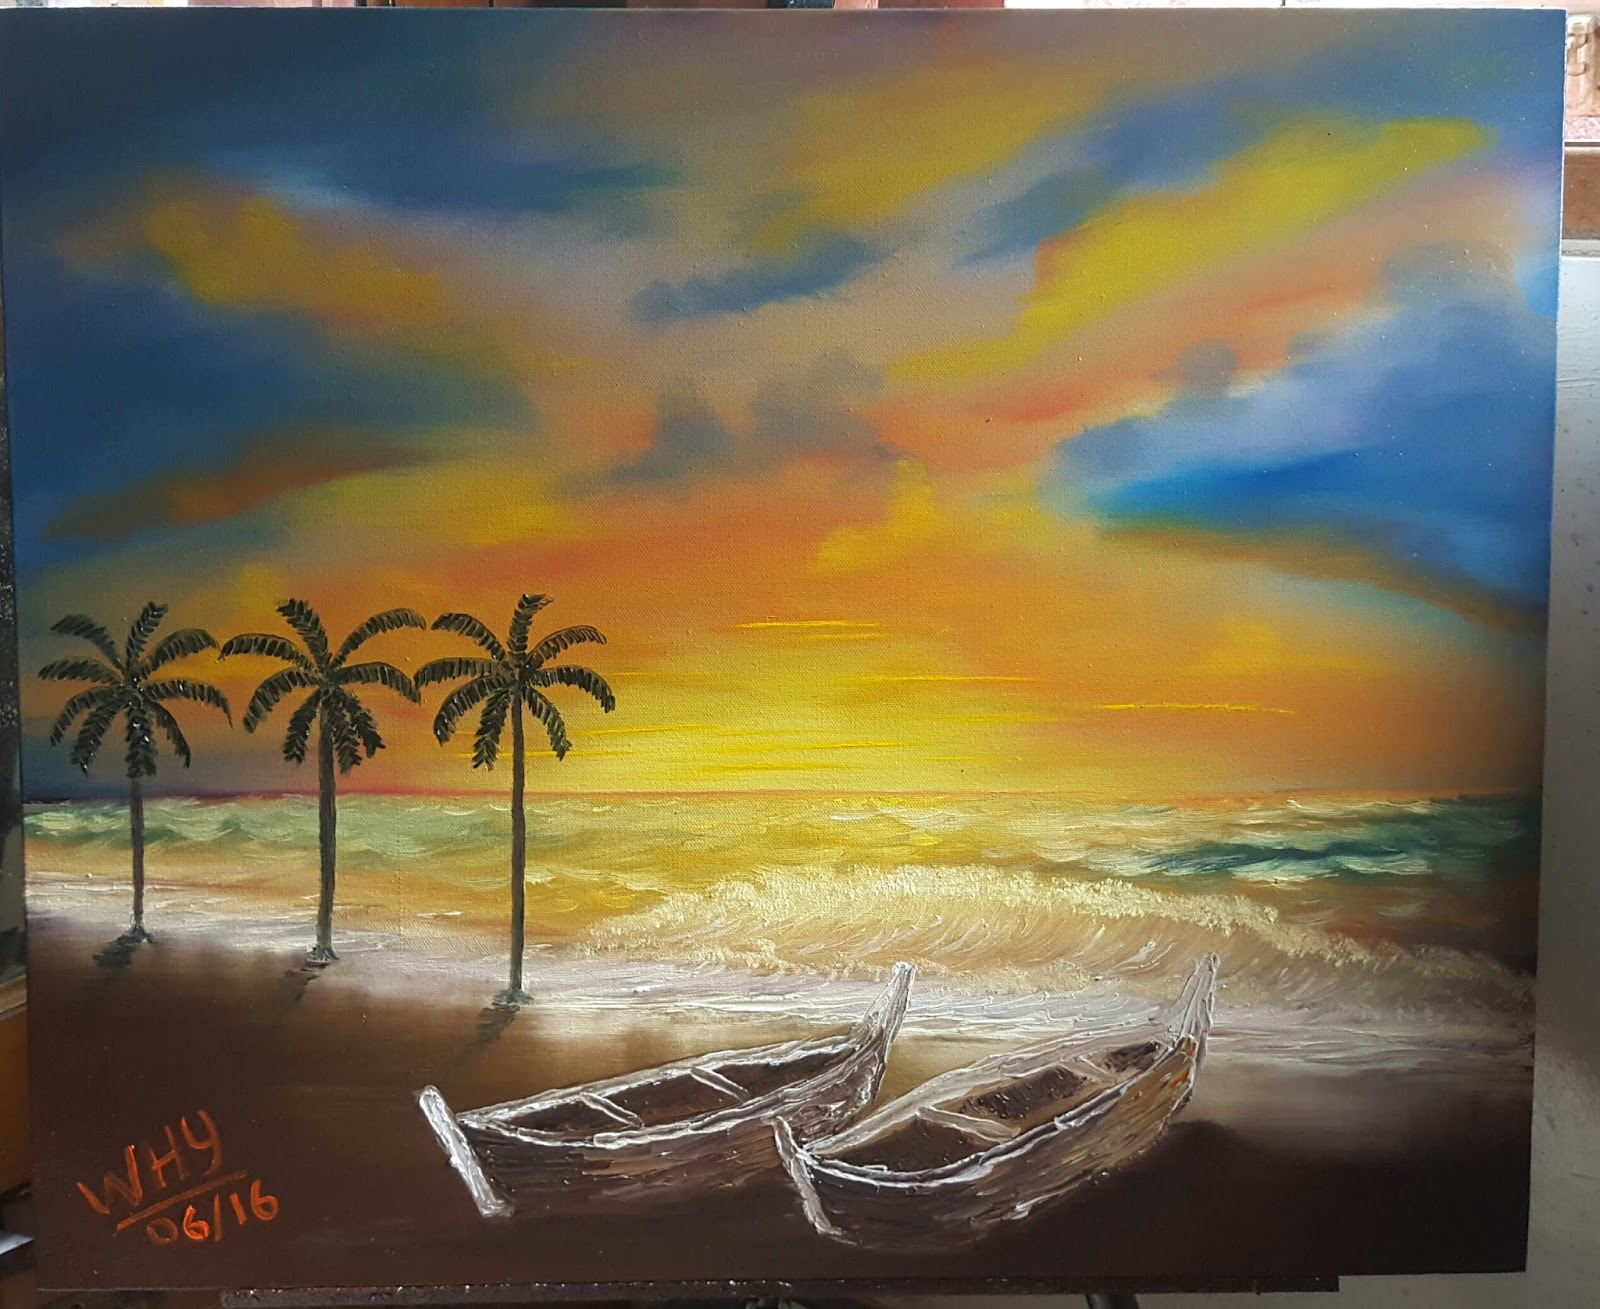 Galeri Lukisanku My Painting Gallery Agustus 2016